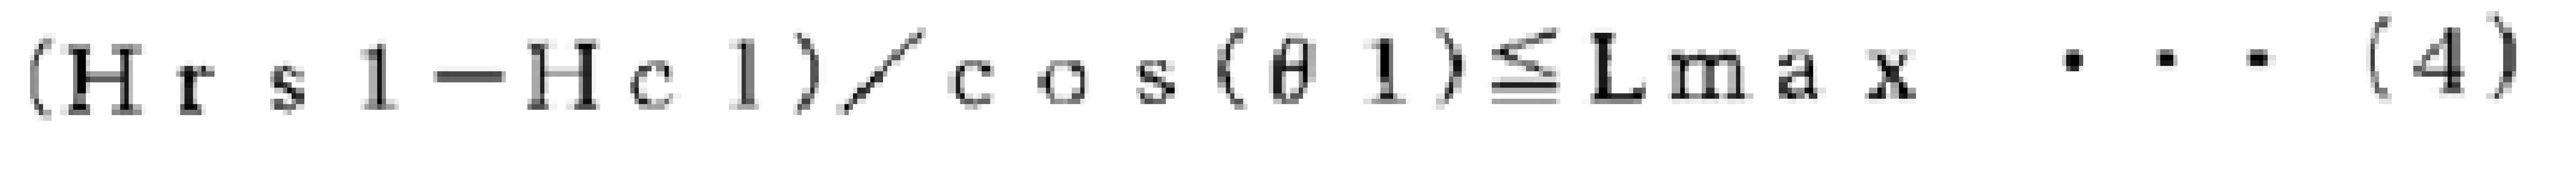 Figure 112019101632726-pct00025